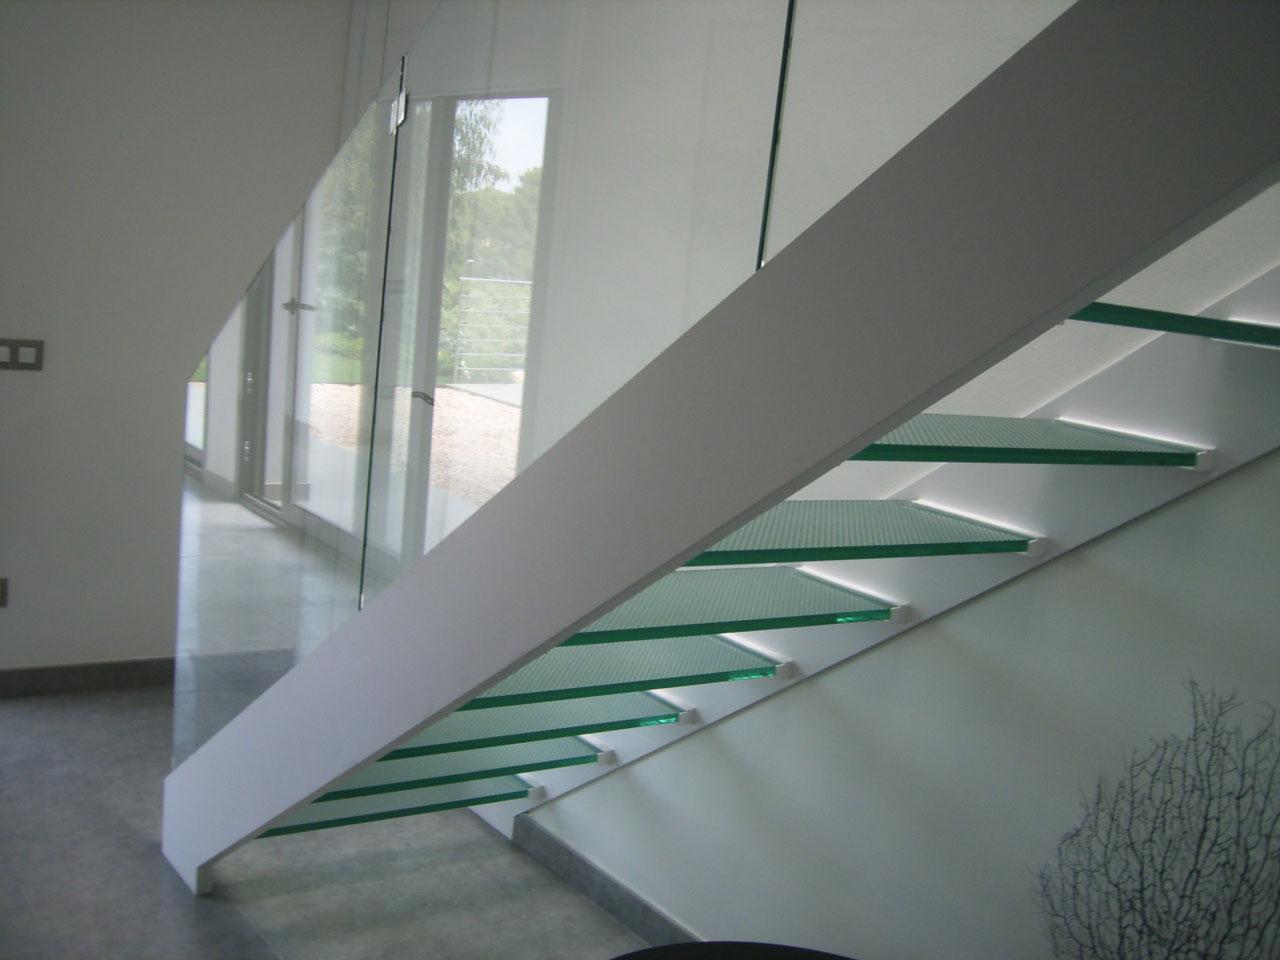 Fabricantes de escaleras de herrer a en bilbao bizkaia - Herrerias en bilbao ...